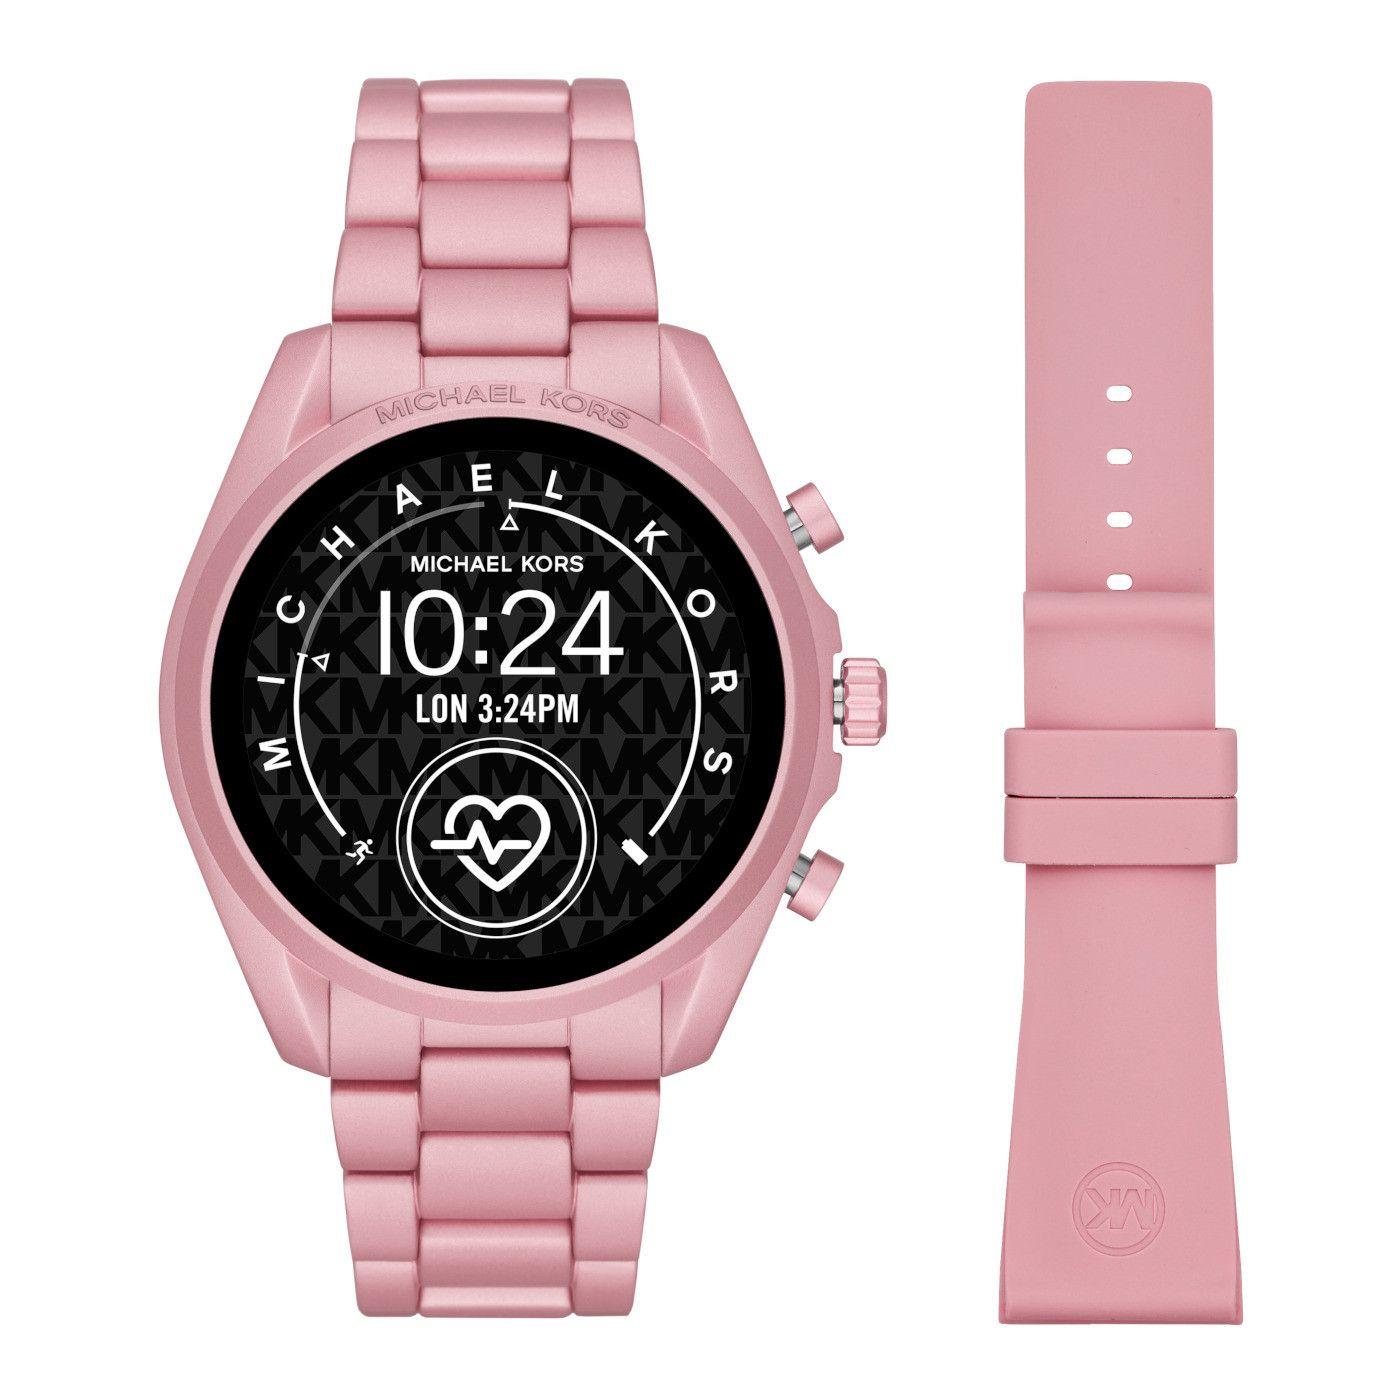 Michael Kors Access Bradshaw Gen 5 Display Smartwatch Mkt5098 In 2020 Michael Kors Bradshaw Michael Kors Smart Watch